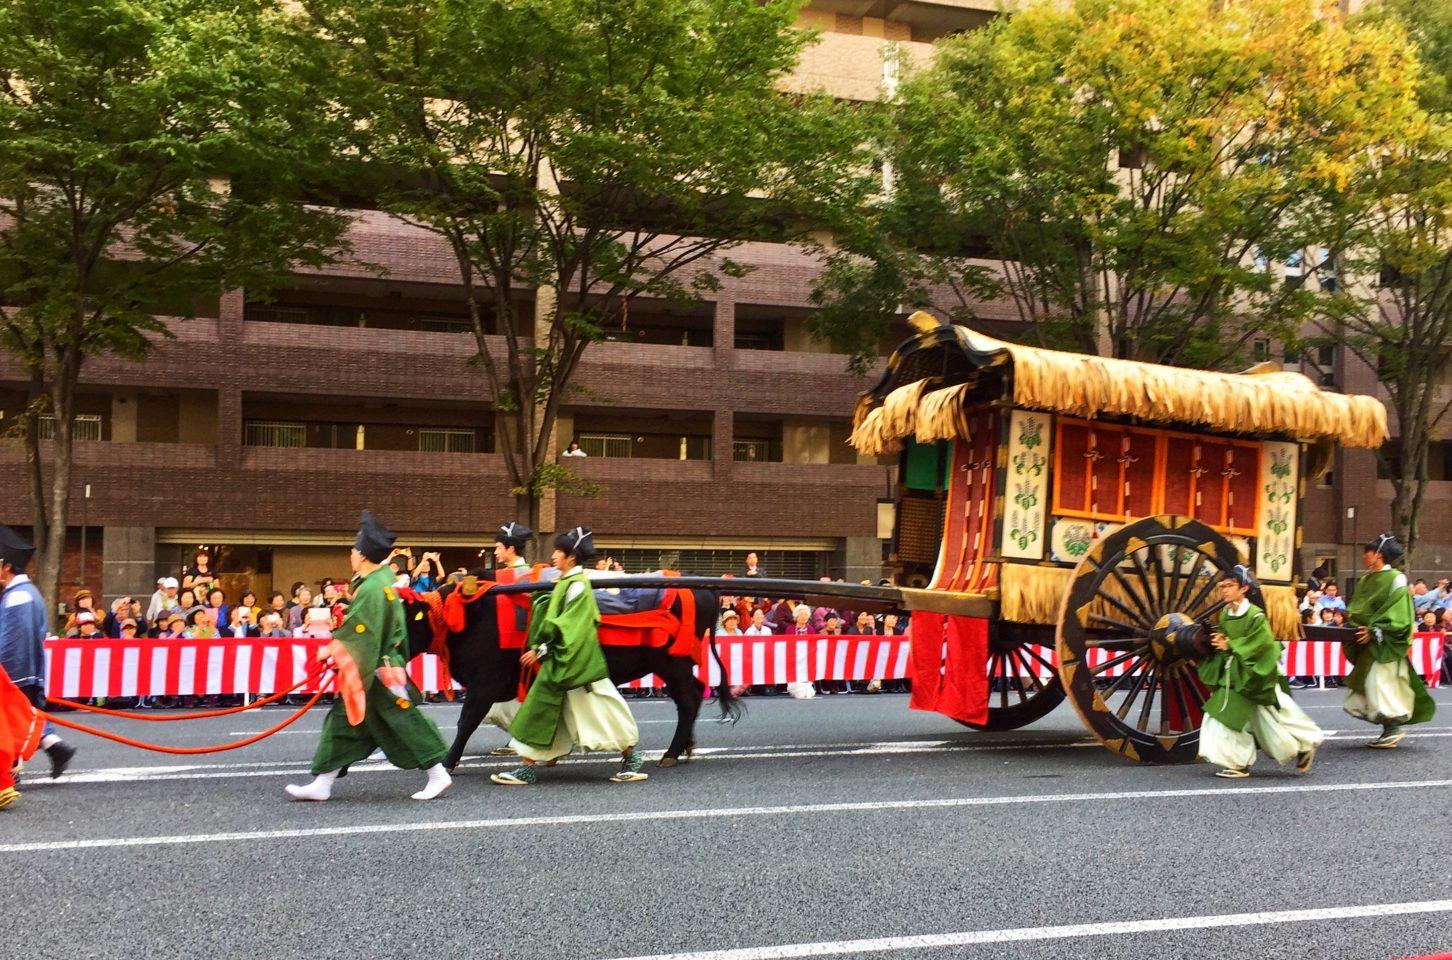 Japan Favorite Experiences ~ The Jidai Matsuri parade every year on October 22nd in Kyoto Japan